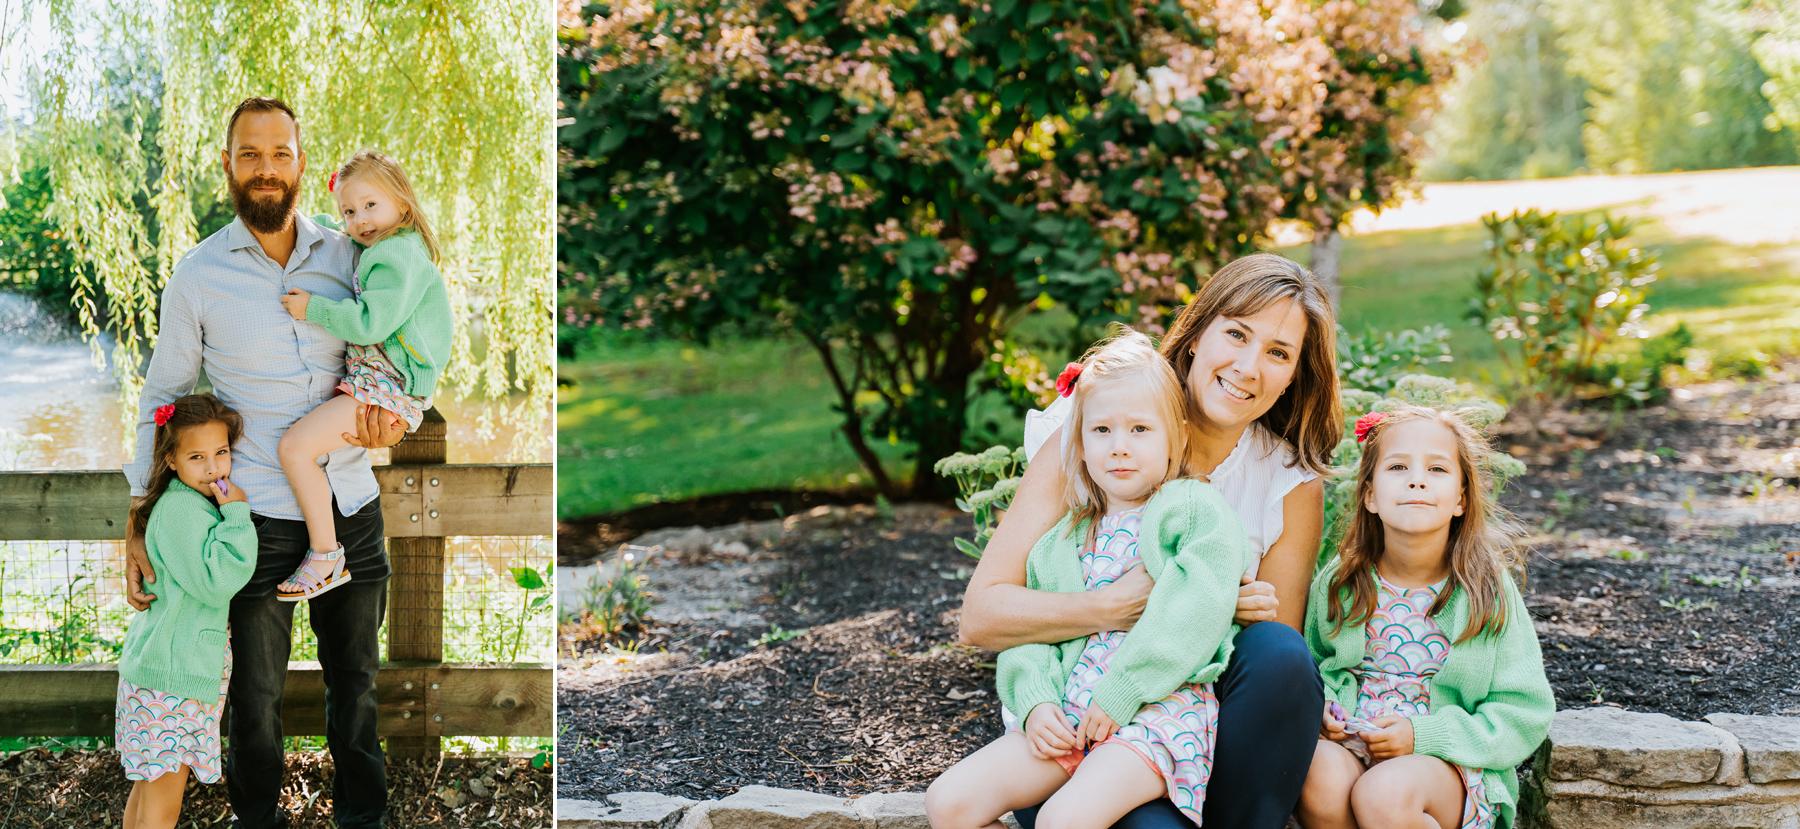 004-fredericton-family-portraits-vs2020